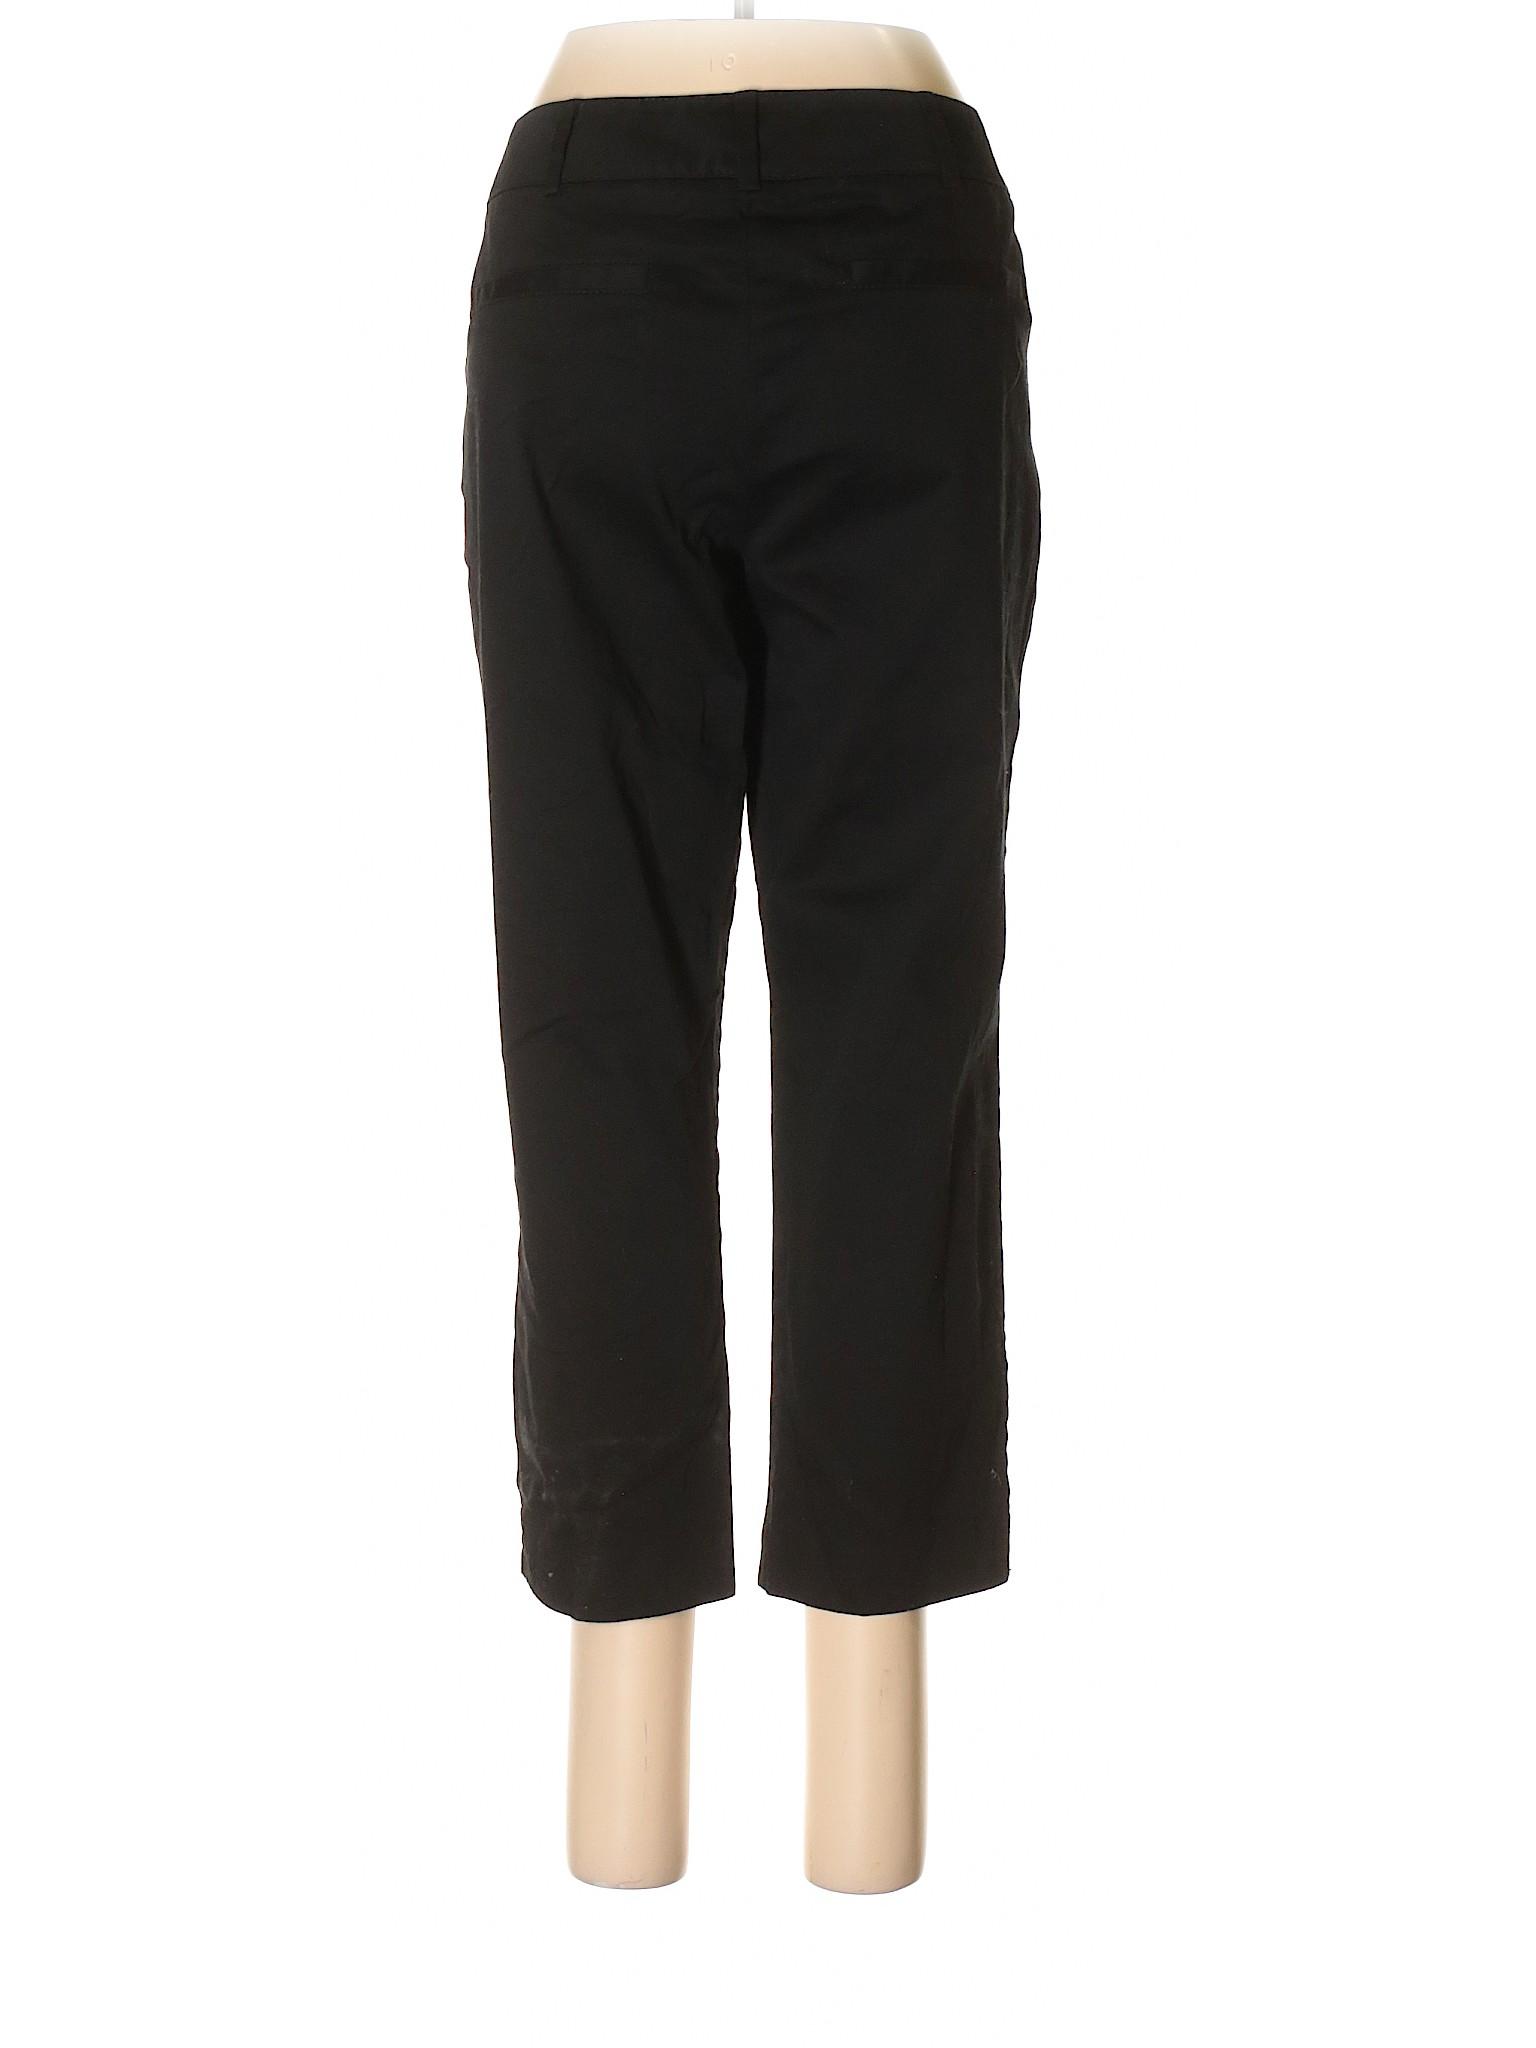 Pants amp; Studio York winter New Avenue Dress 7th Company Design Leisure qHv0gIwB